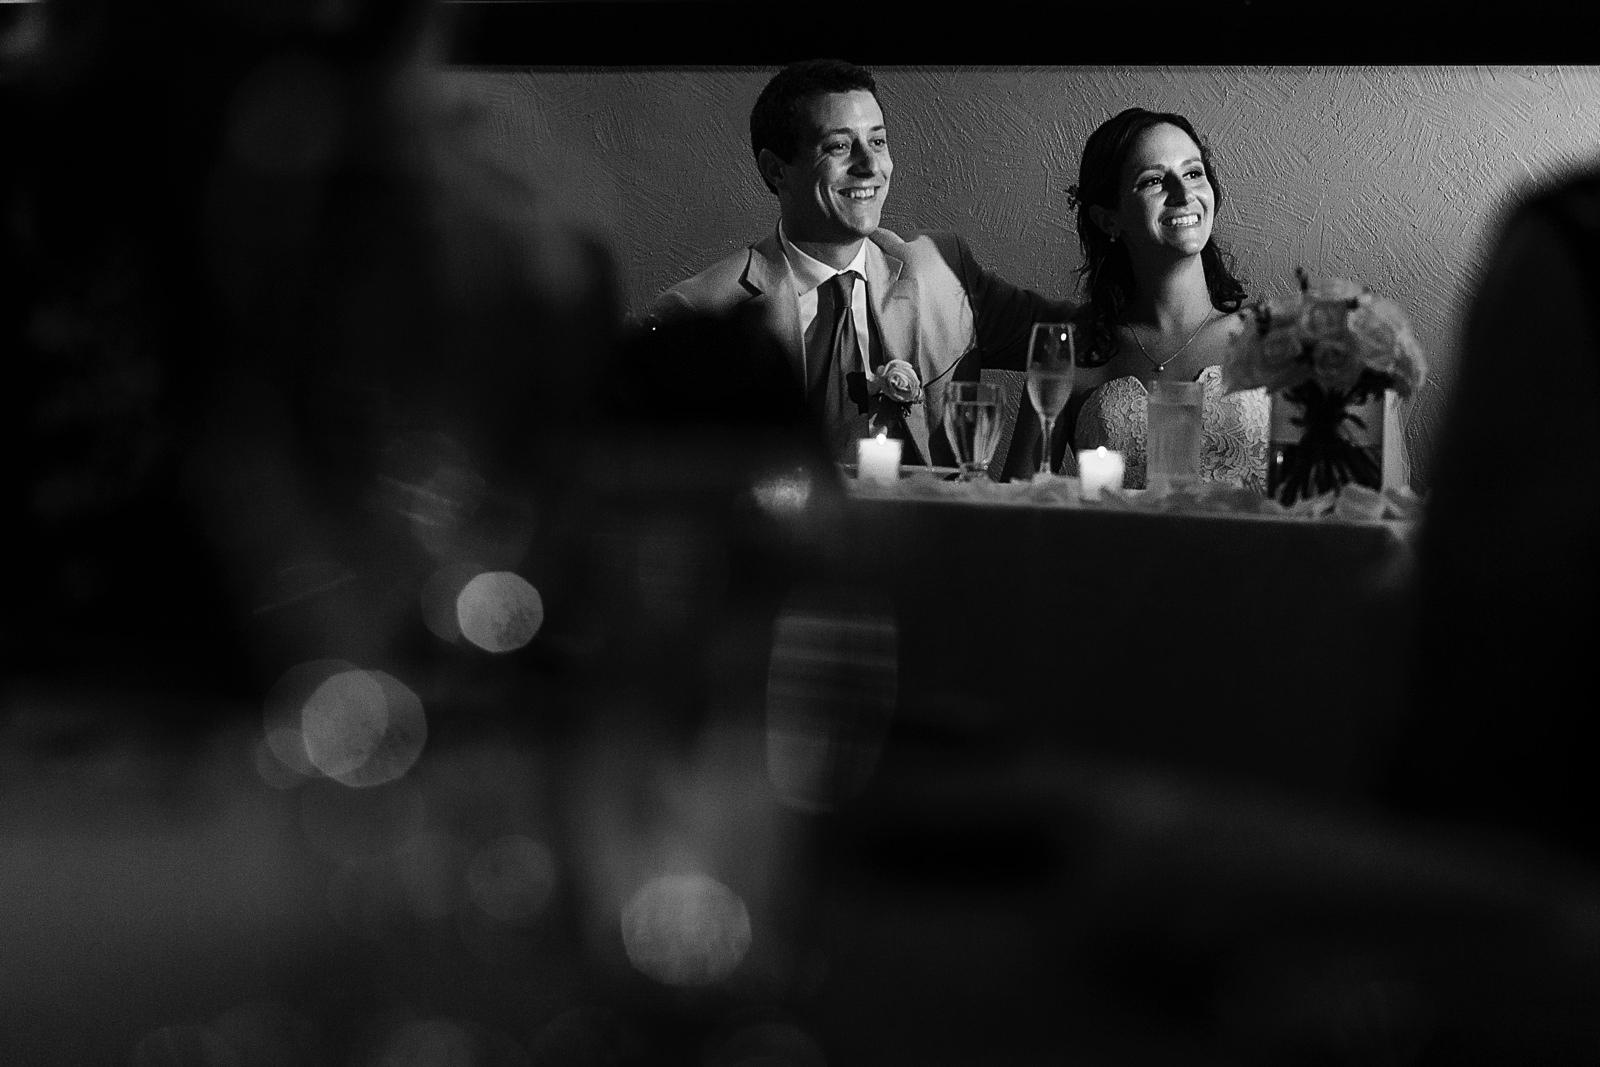 Couple's reaction to father of the bride speech during wedding reception - Eder Acevedo cancun los cabos vallarta wedding photographer